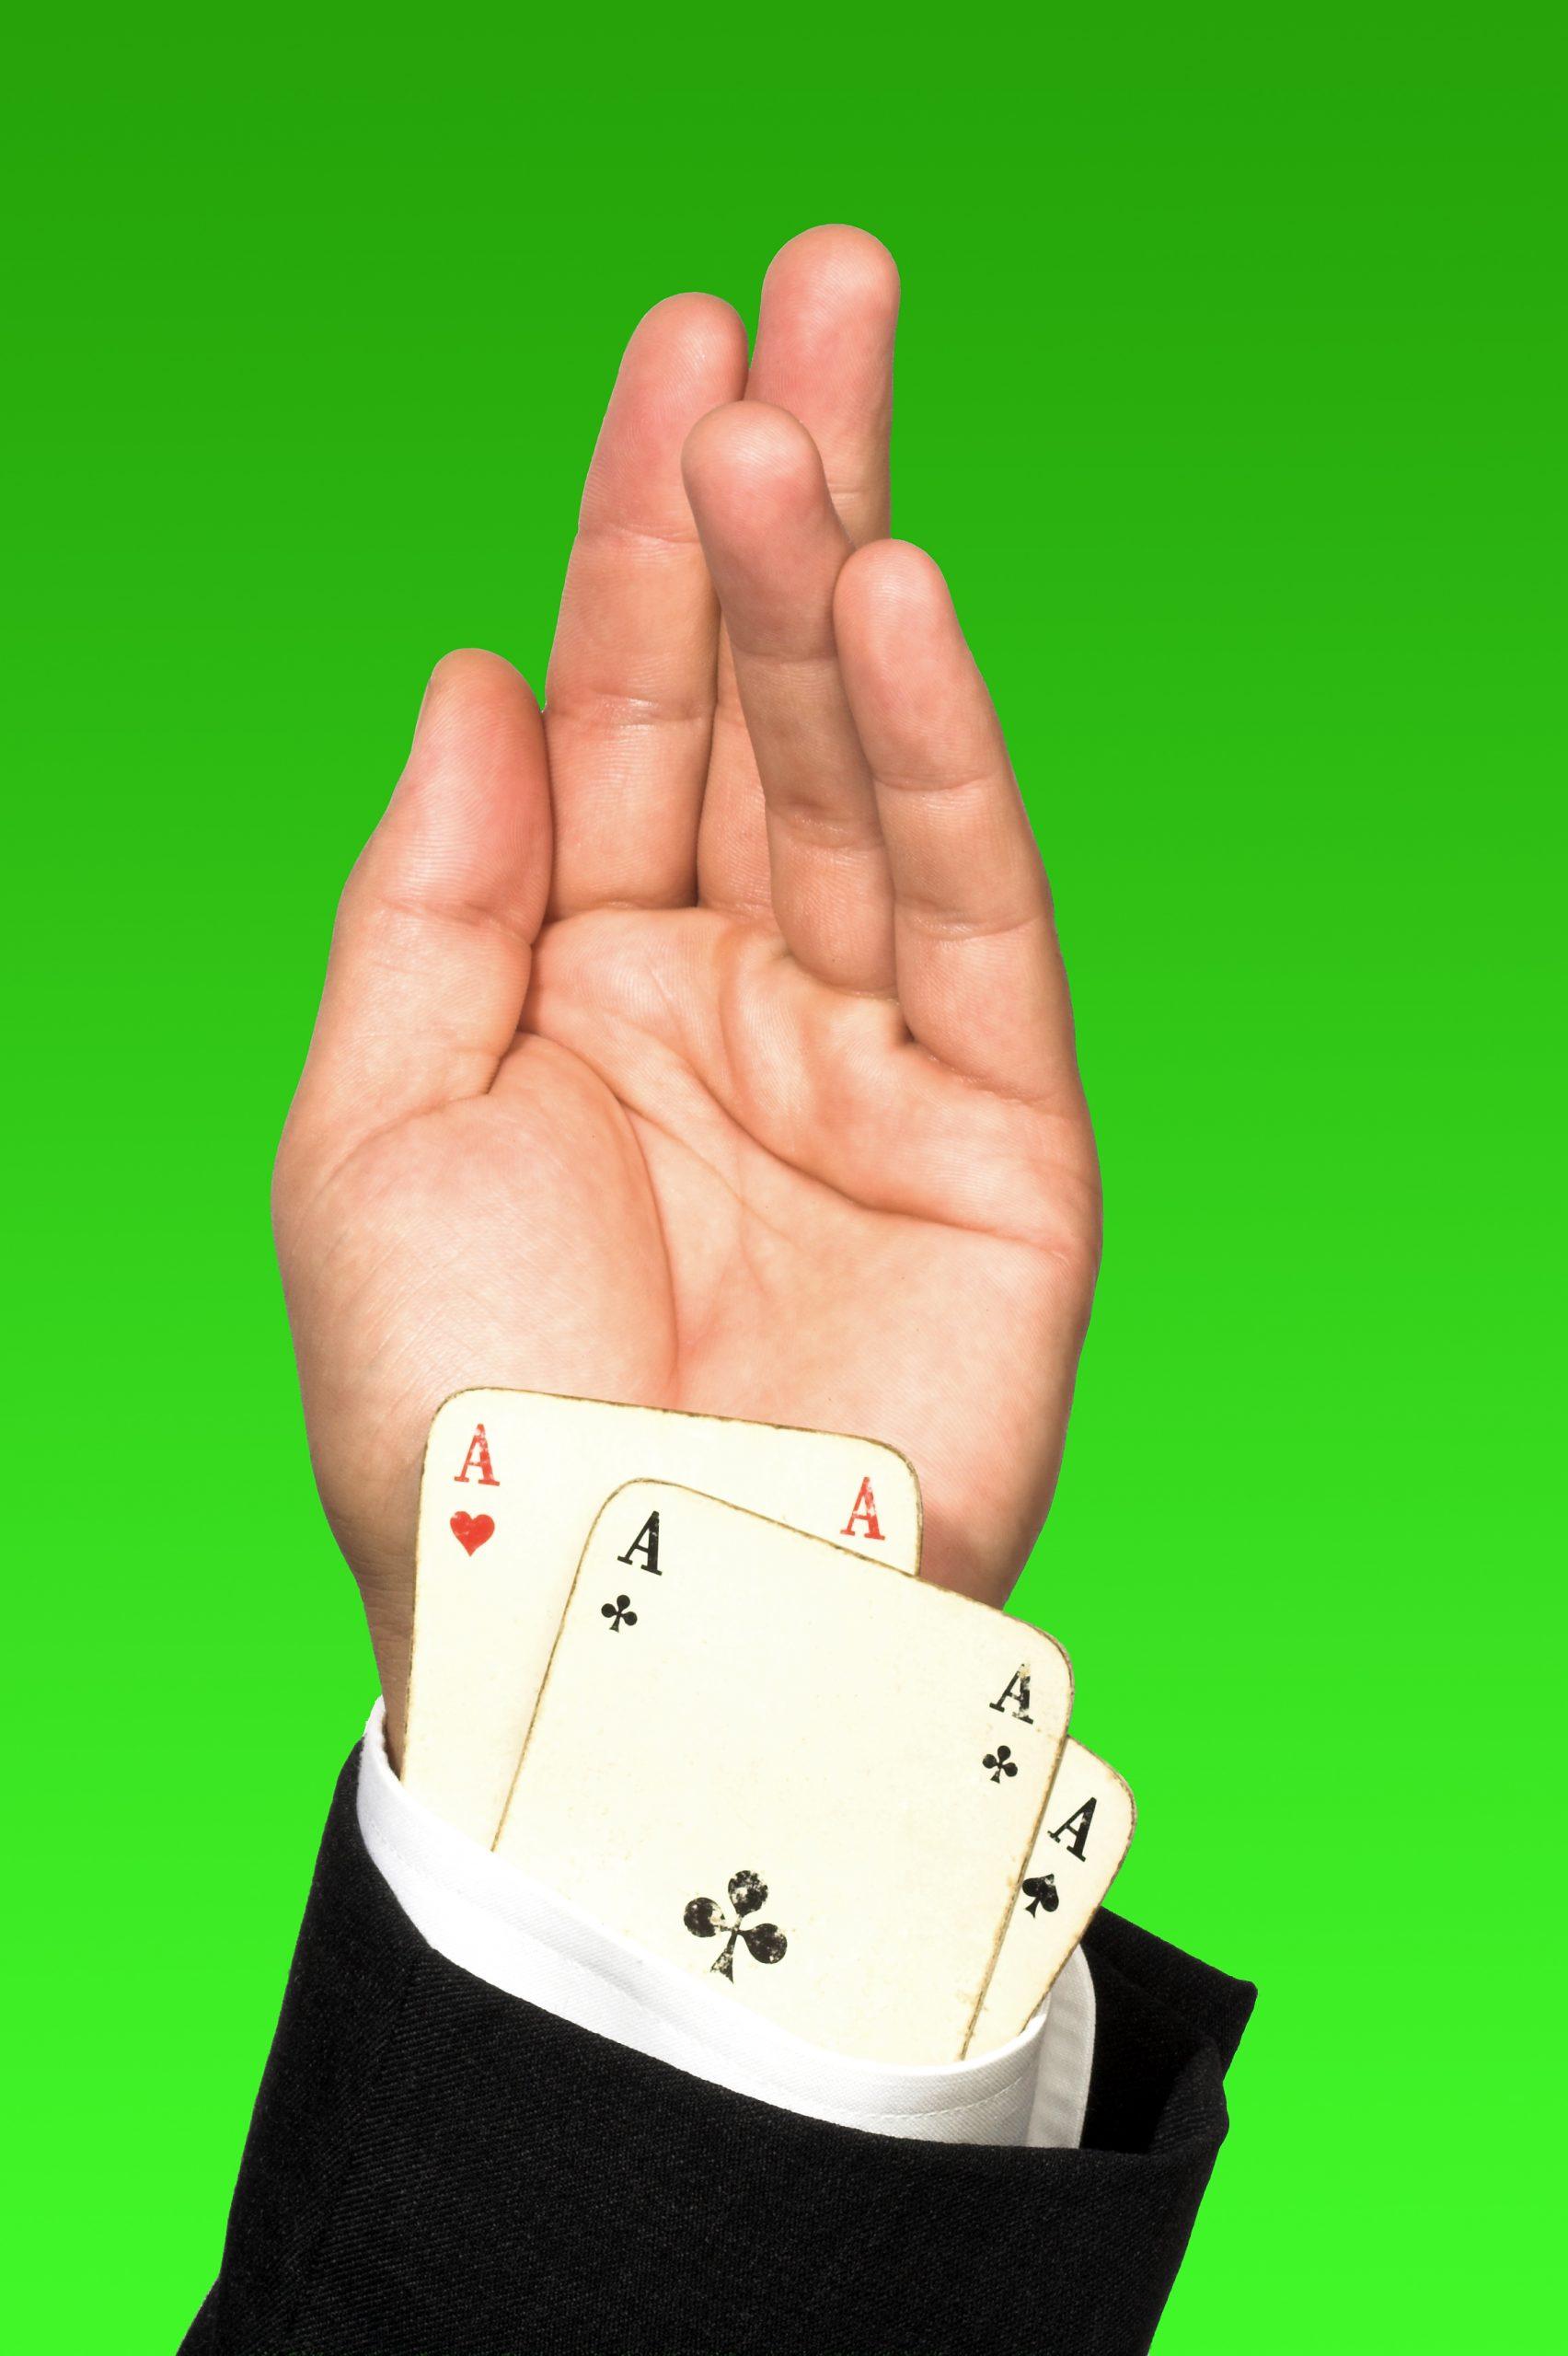 https://depositphotos.com/3446916/stock-photo-cheating-poker-player.html